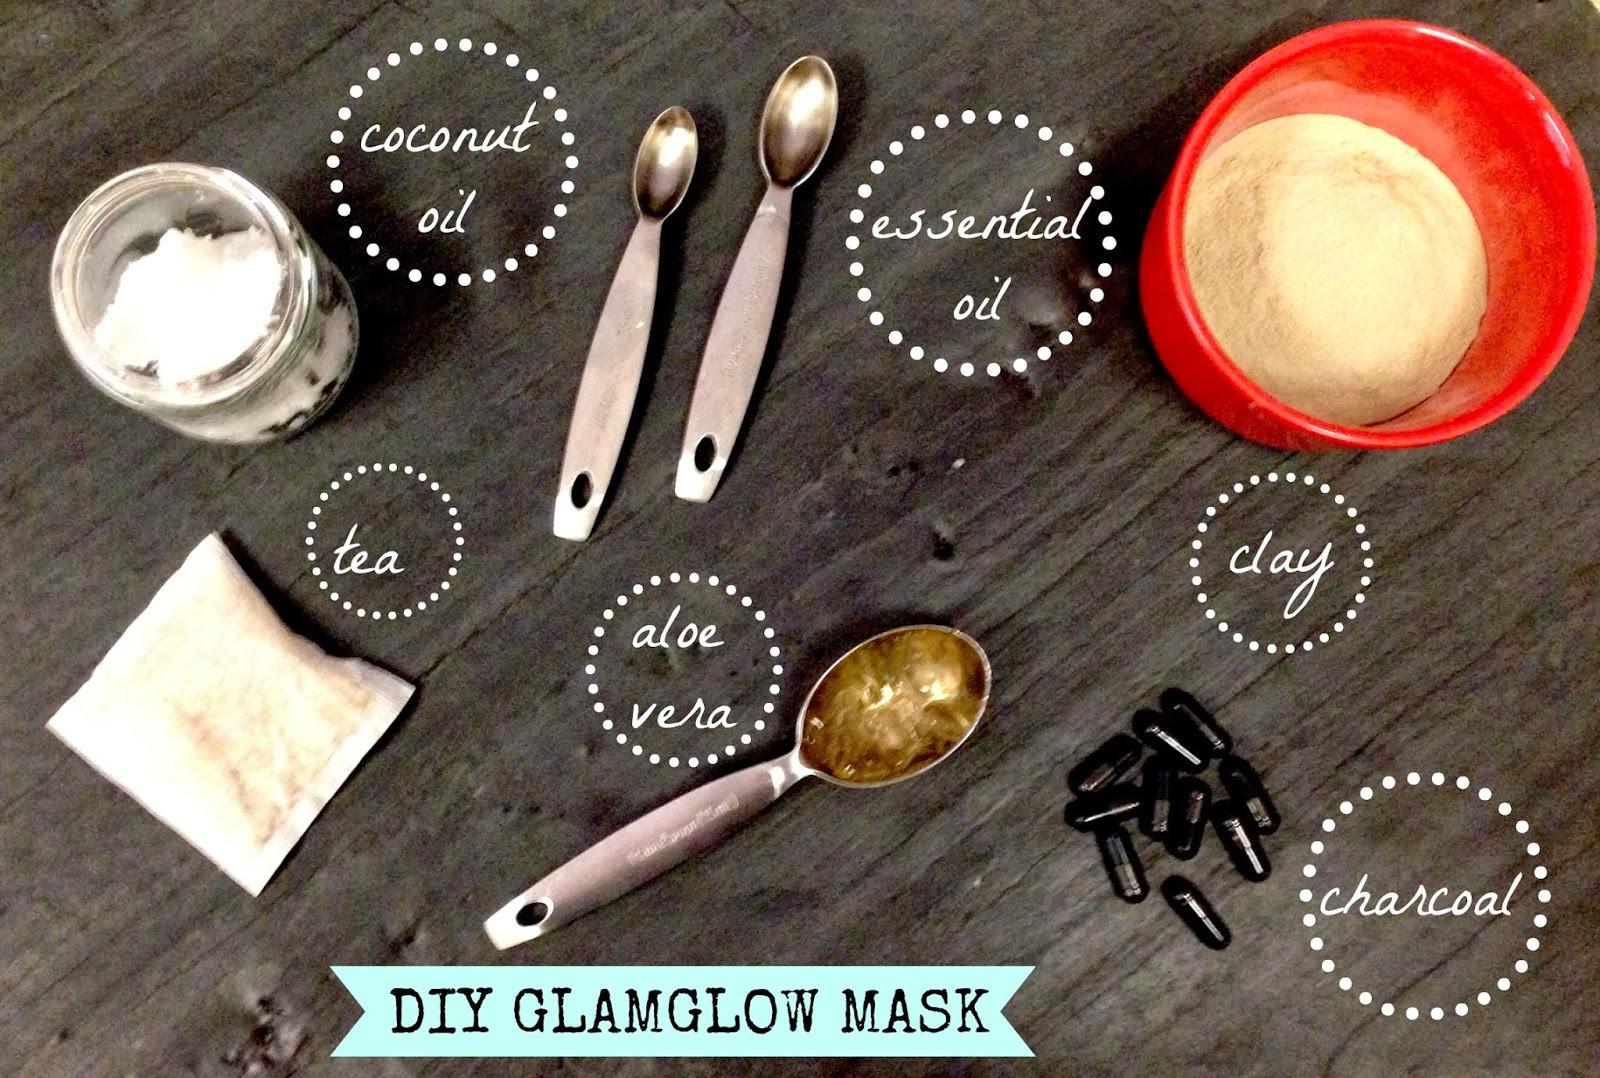 DIY Charcoal Face Mask  DIY GLAMGLOW FACE MASK